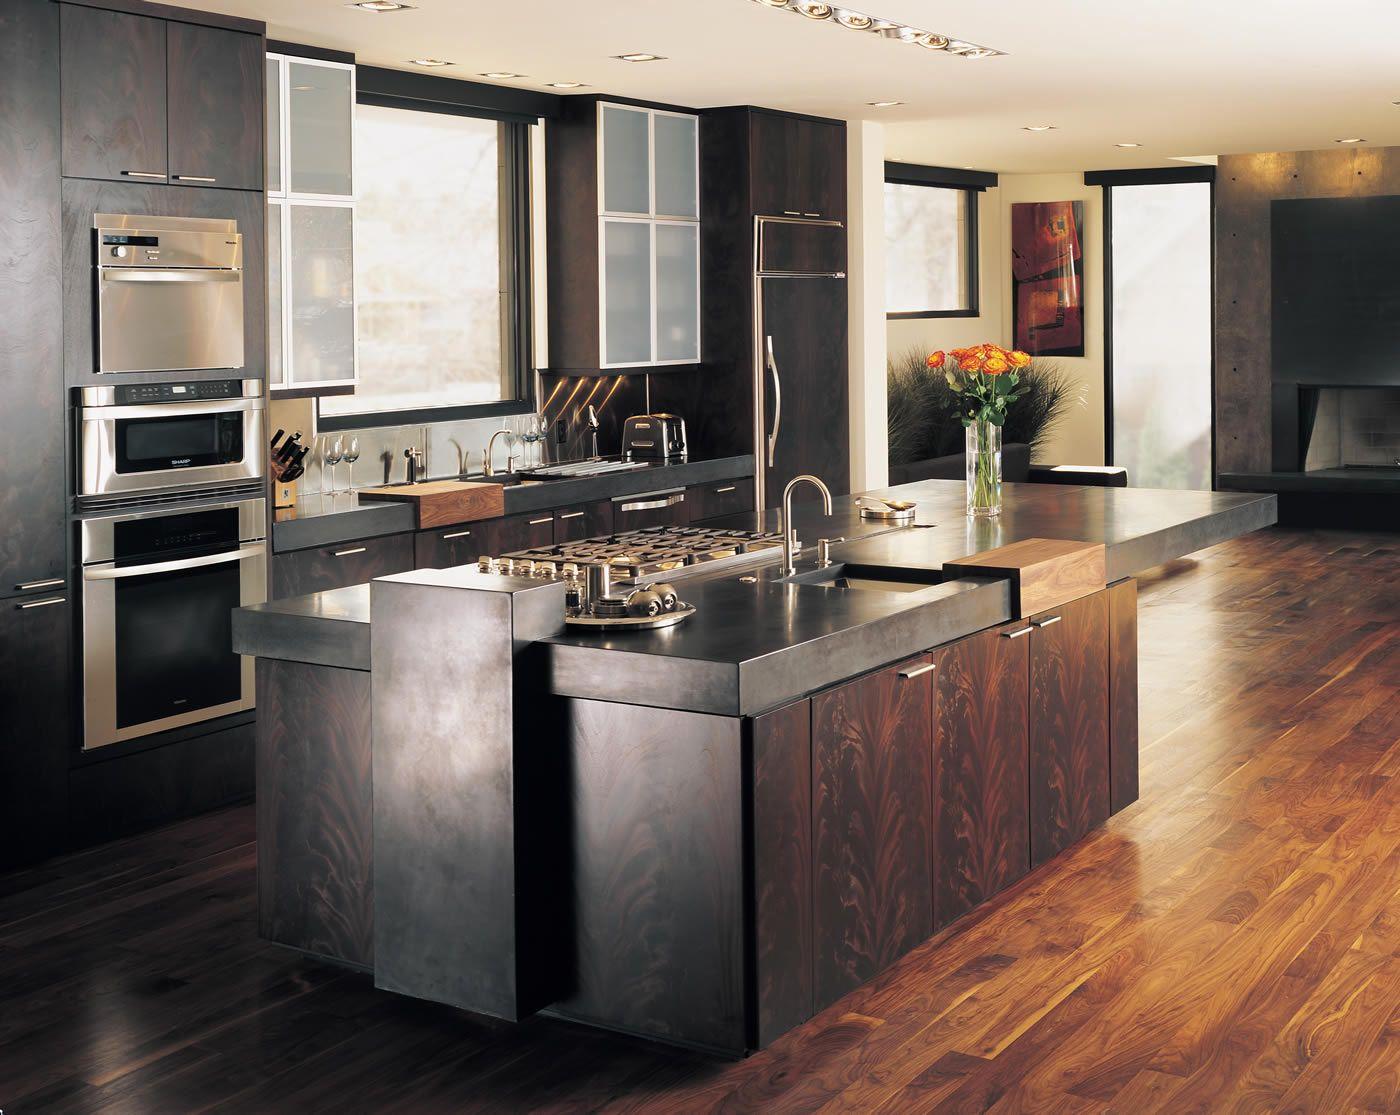 kitchen-astounding-boulder-kitchen-decoration-with-mahogany-wood ...